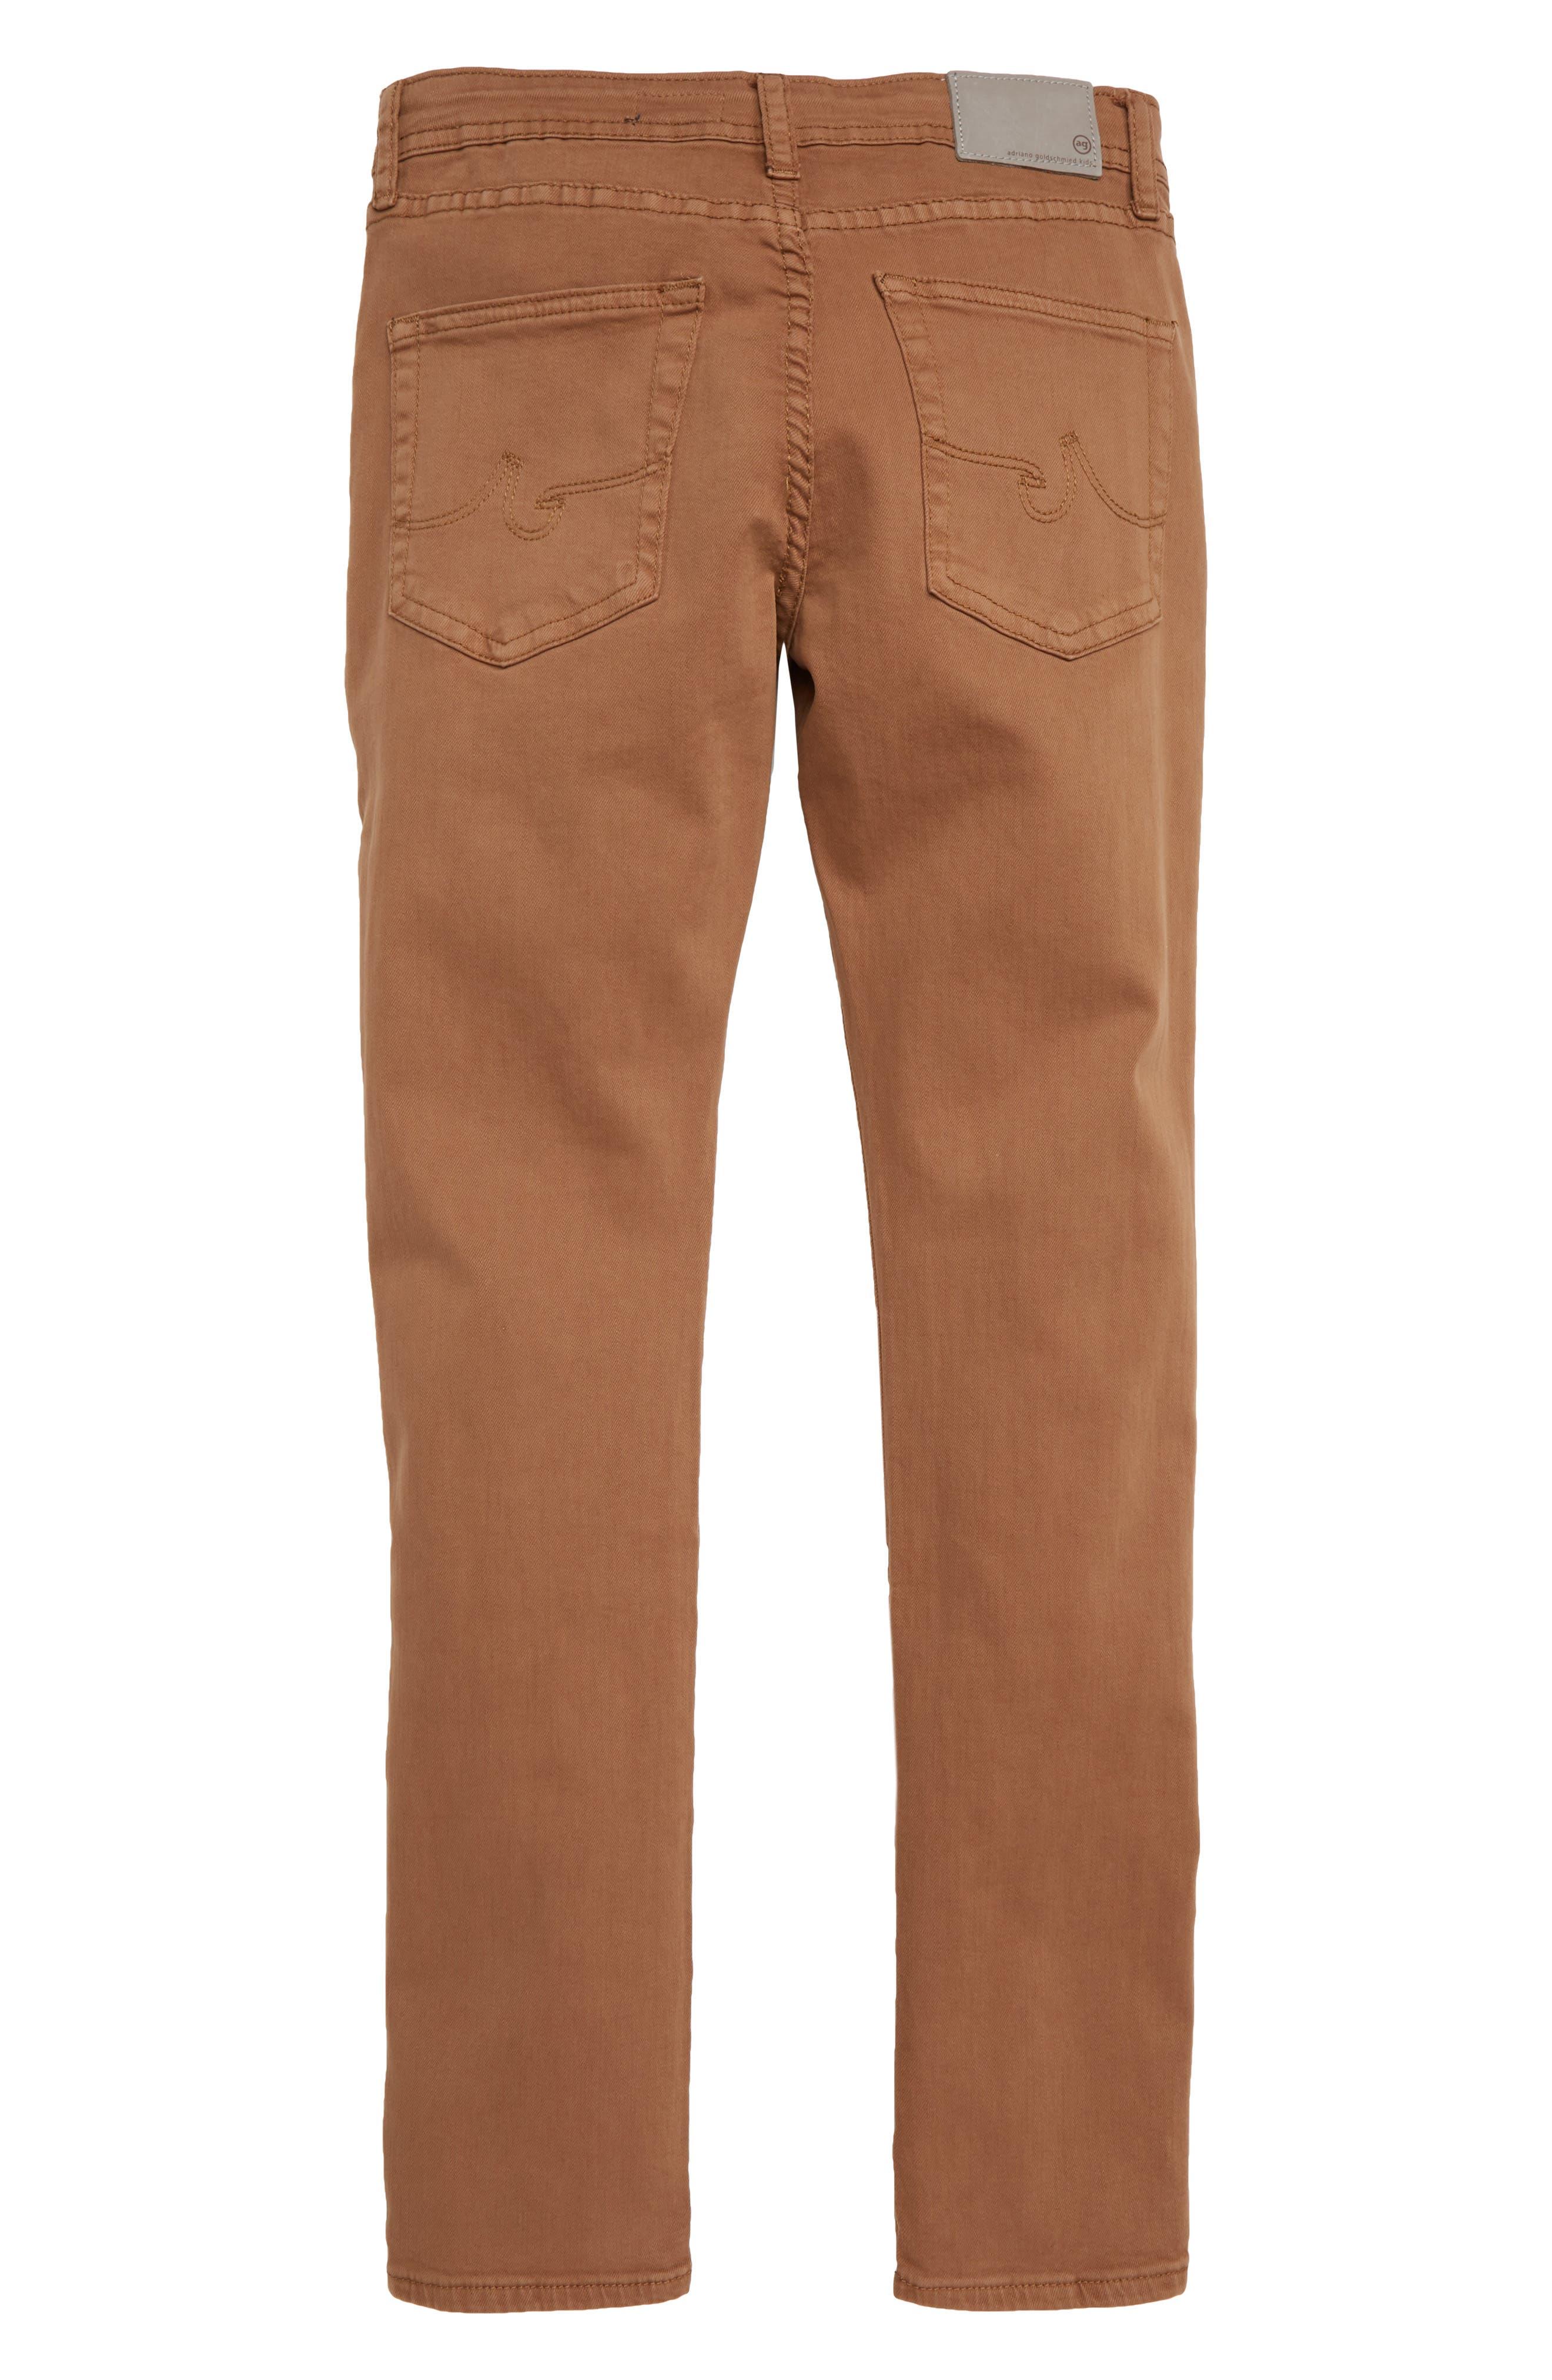 adriano goldschmied kids The Ryker Slim Skinny Jeans,                             Alternate thumbnail 2, color,                             MUSTARD GOLDEN OLIVE